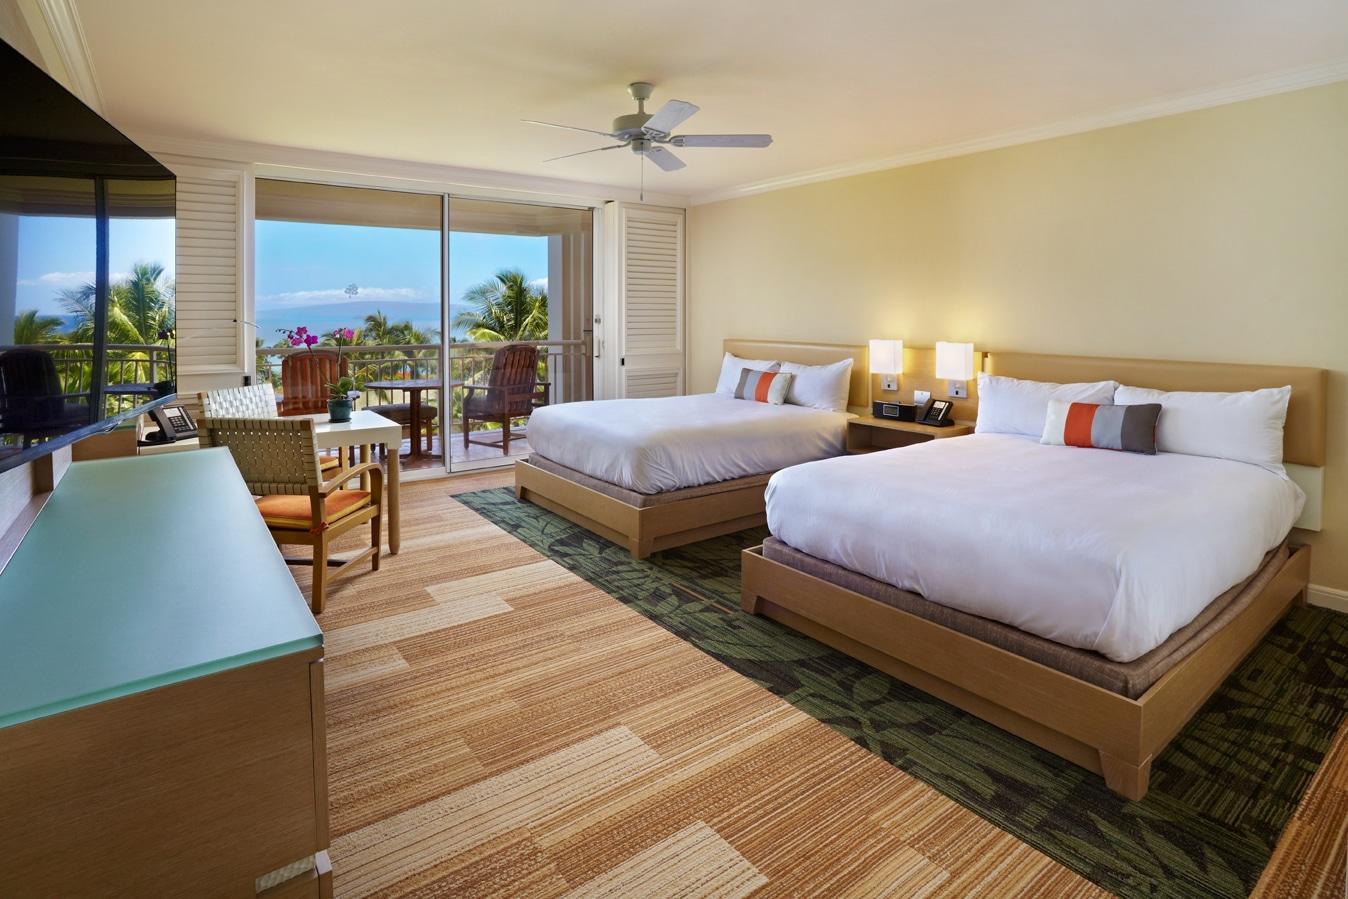 Best Maui hotels: Grand Wailea, a Waldorf Astoria Resort